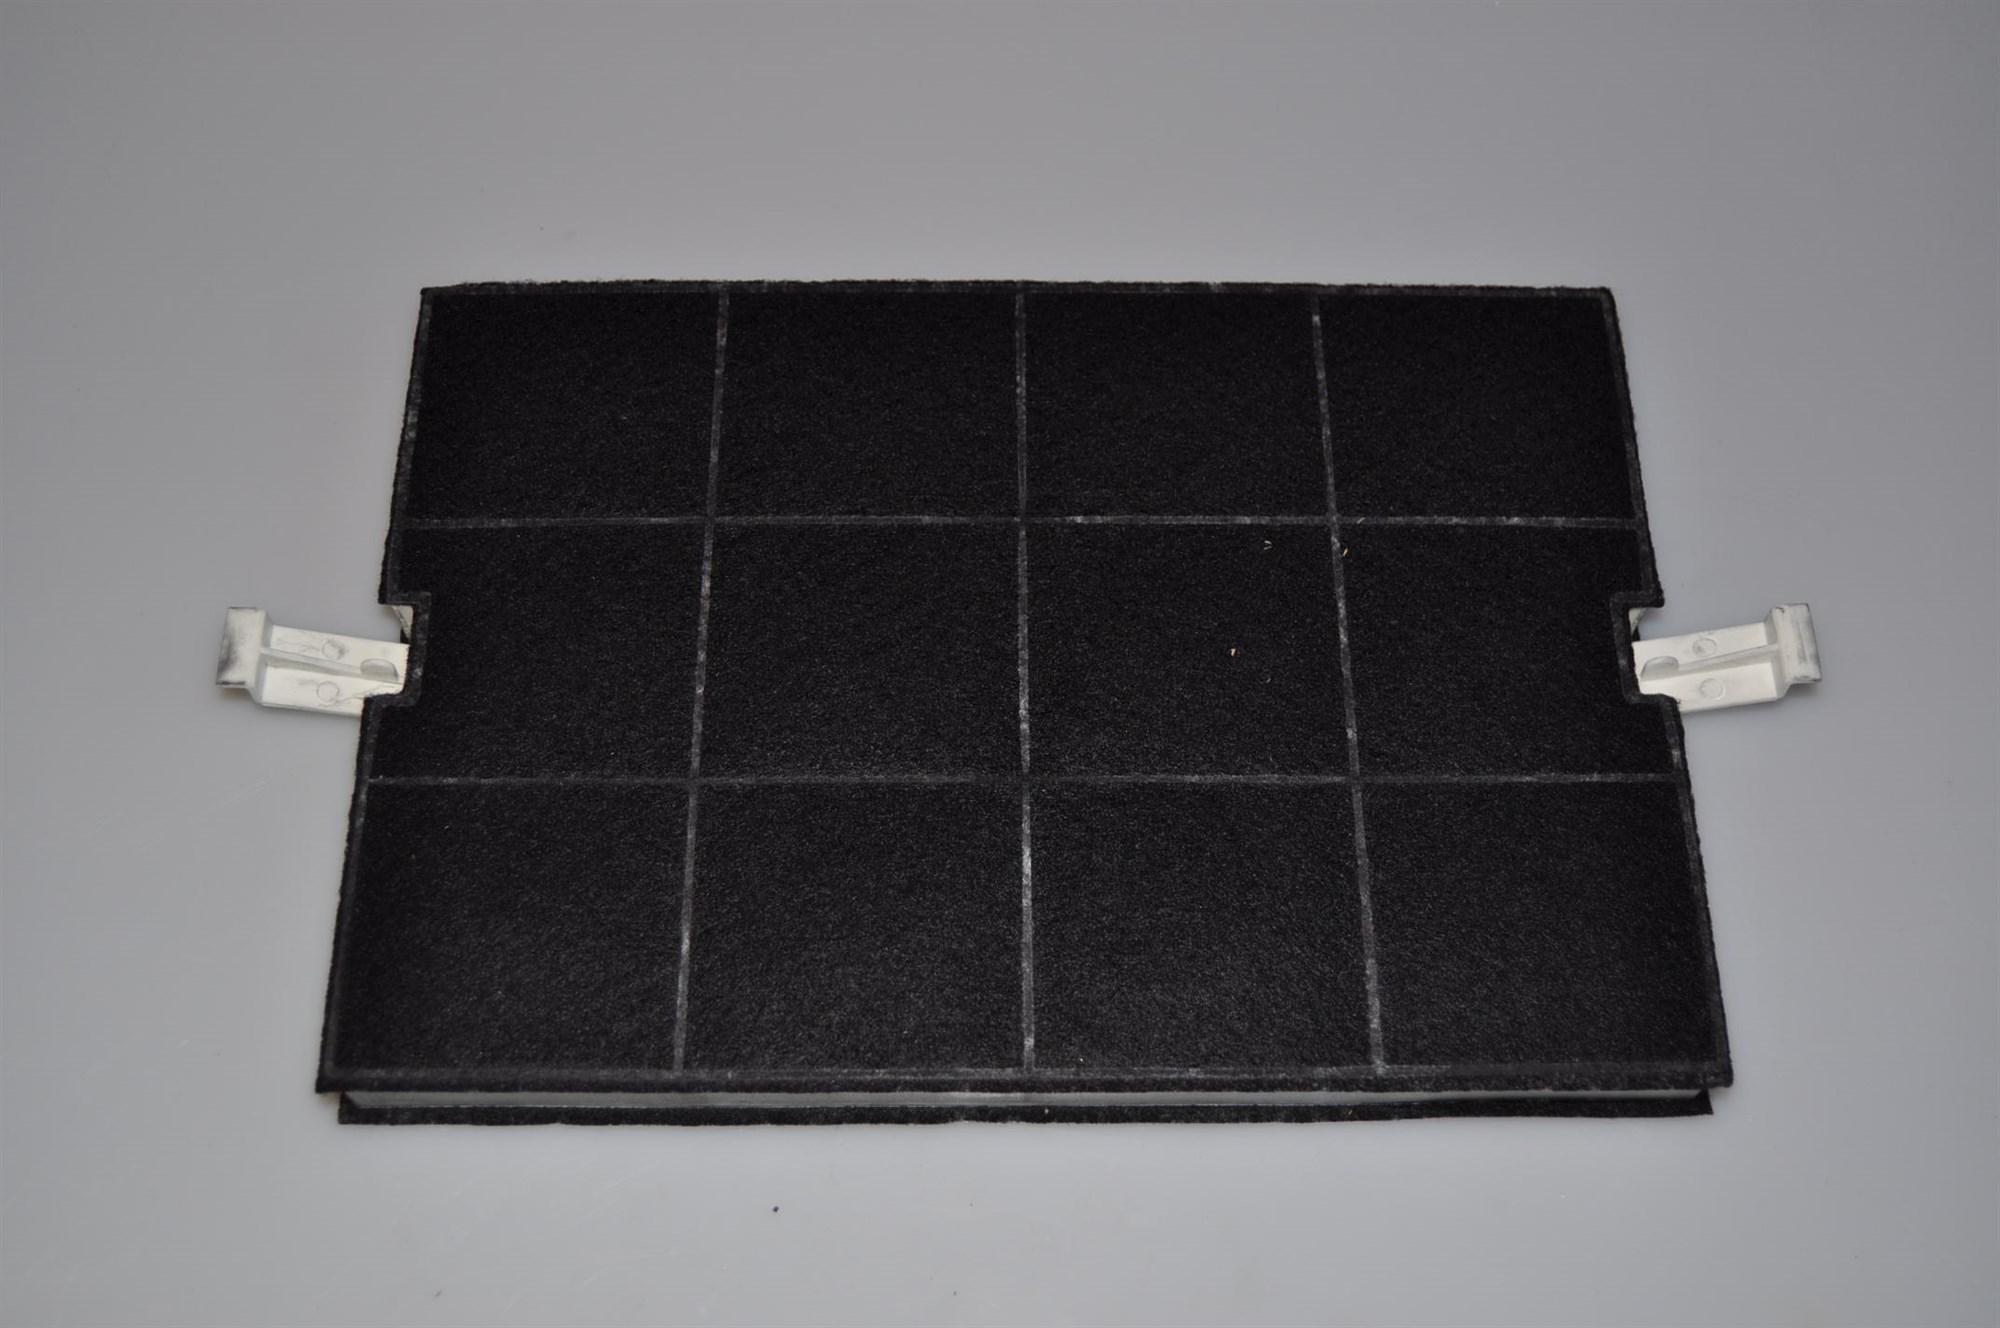 Kohlefilter siemens dunstabzugshaube 22 mm x 204 mm x 296 mm